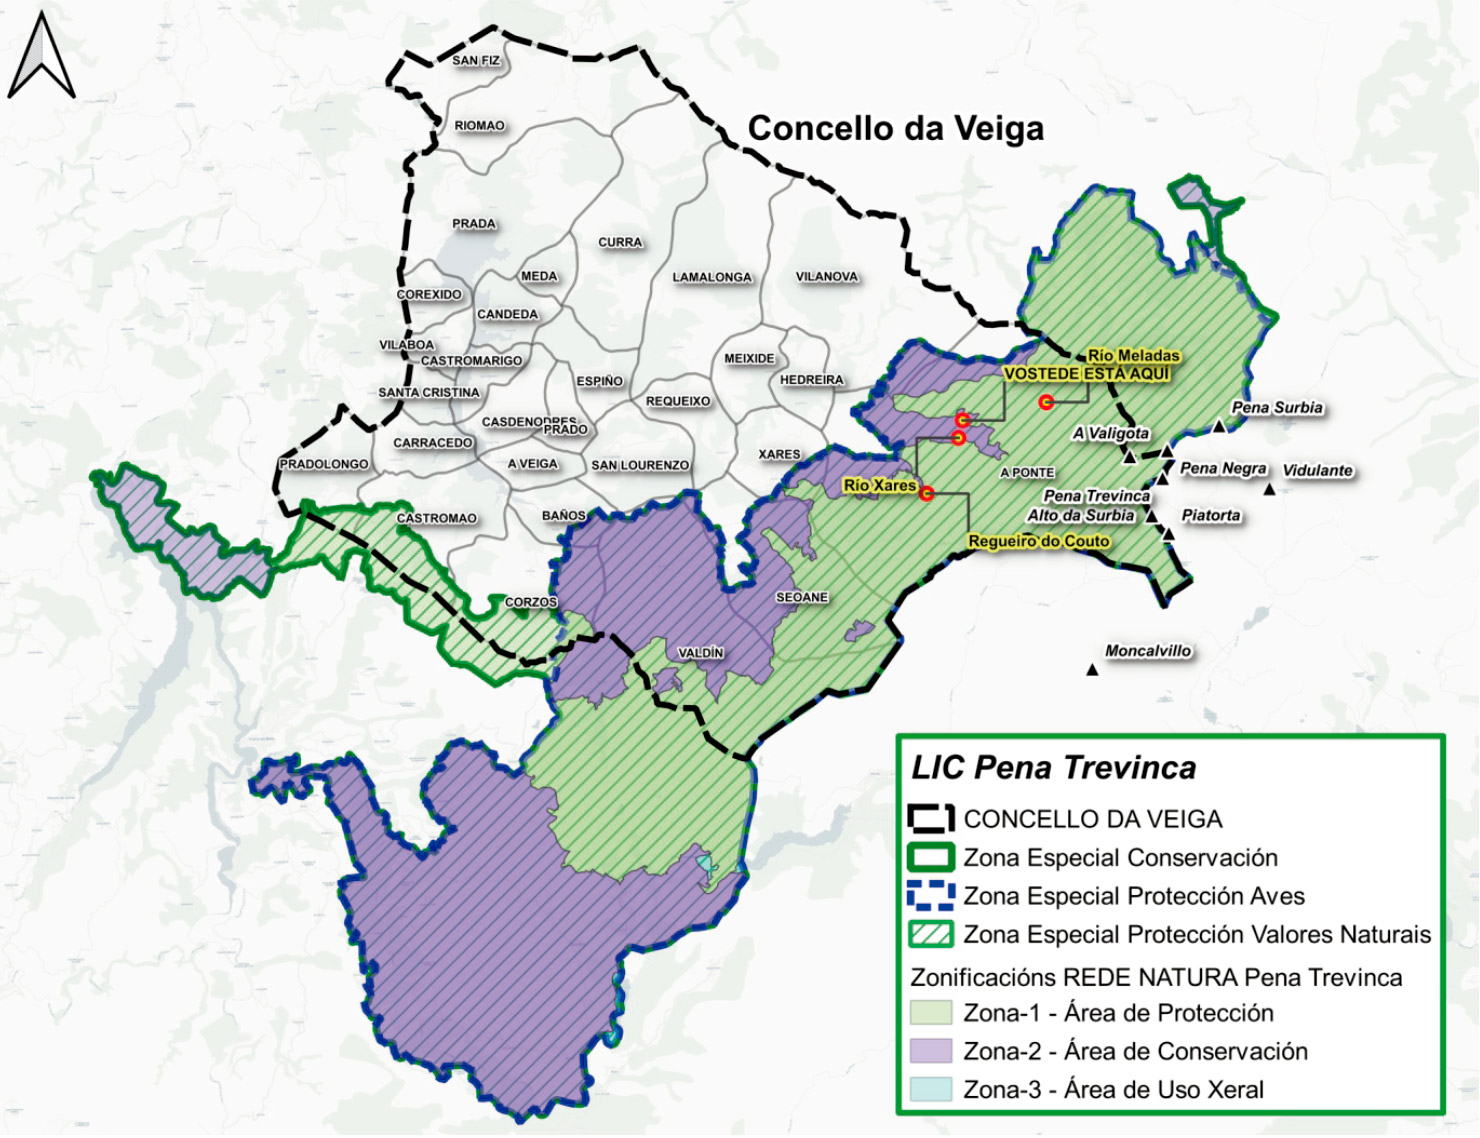 Mapa LIC Pena Trevinca